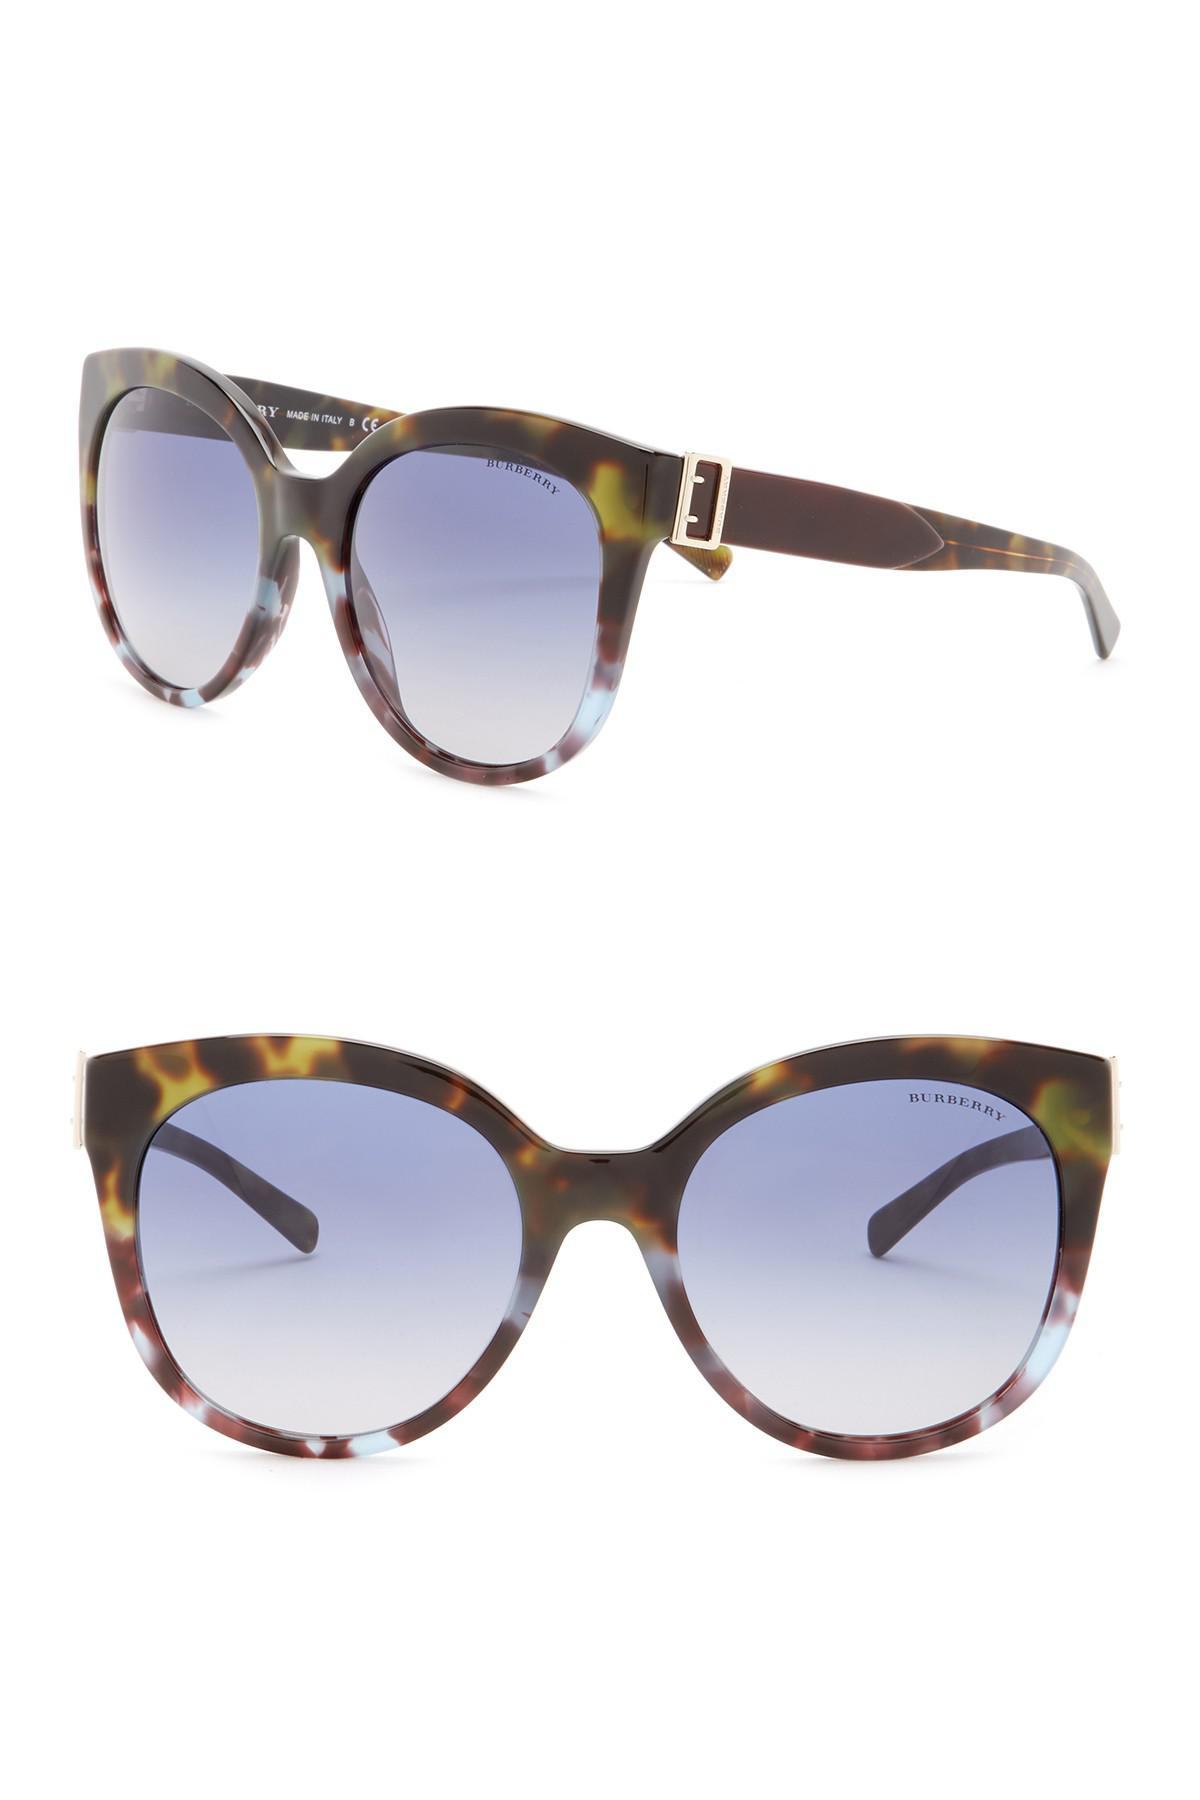 af3e74714b Burberry - Multicolor 55mm Cat Eye Sunglasses - Lyst. View fullscreen